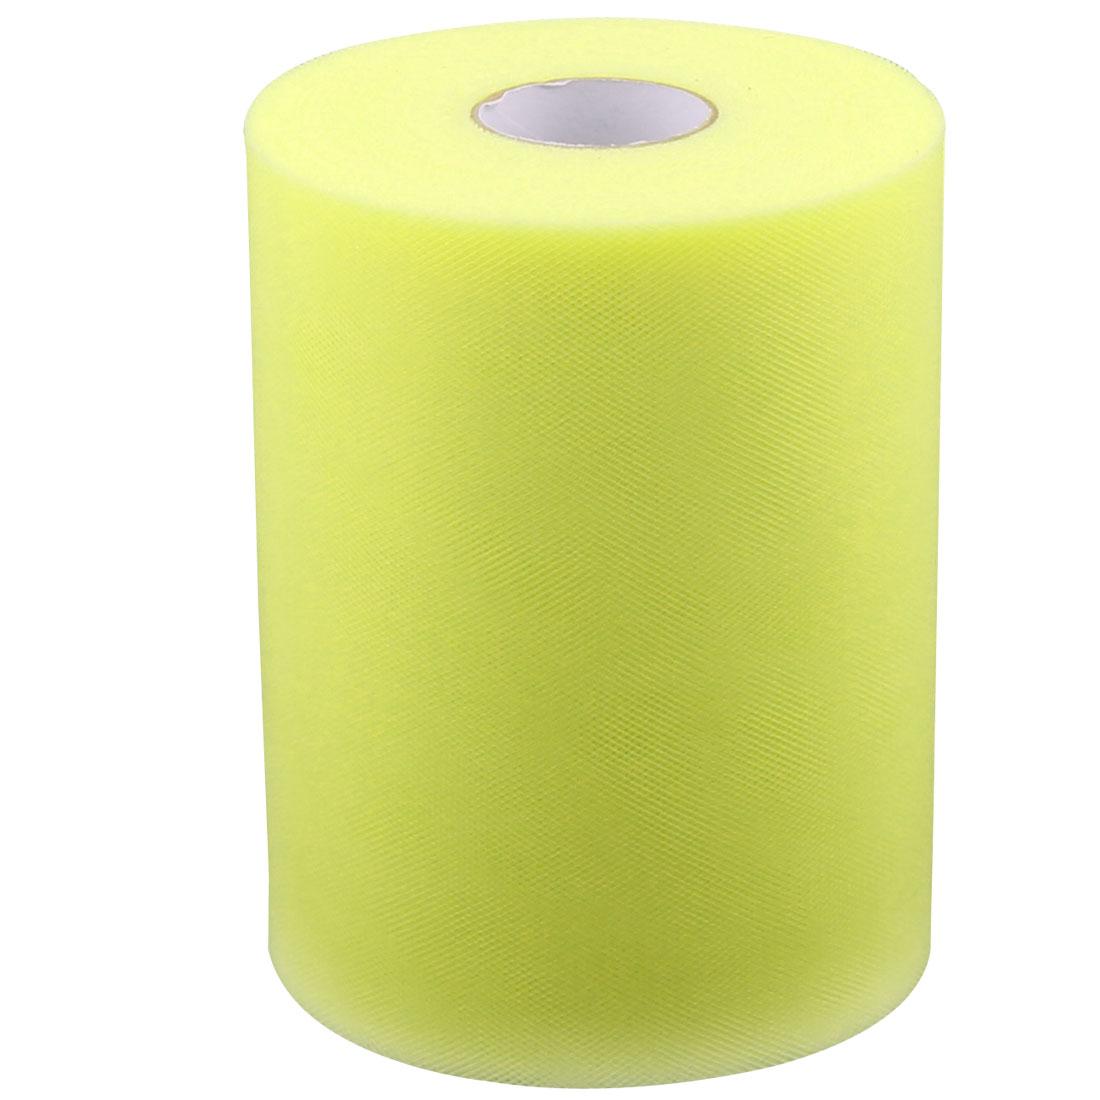 Banquet Wedding Party Nylon DIY Tutu Tulle Spool Decor Light Yellow 100 Yards